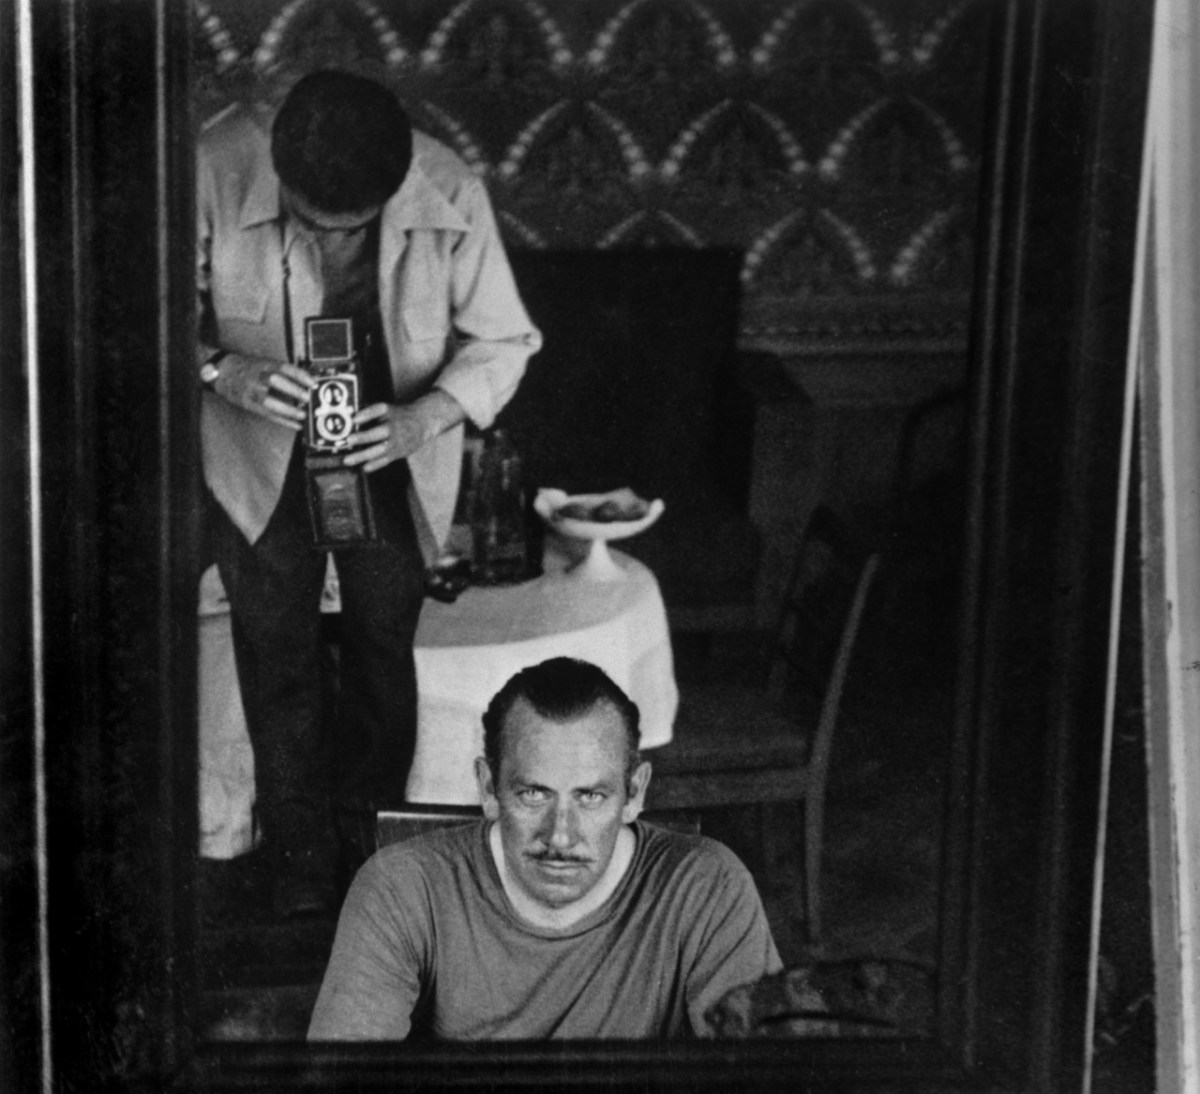 John Steinbeck ve Robert Capa. Moskova, 1947. Fotoğraf: Robert Capa © International Center of Photography | Magnum Photos